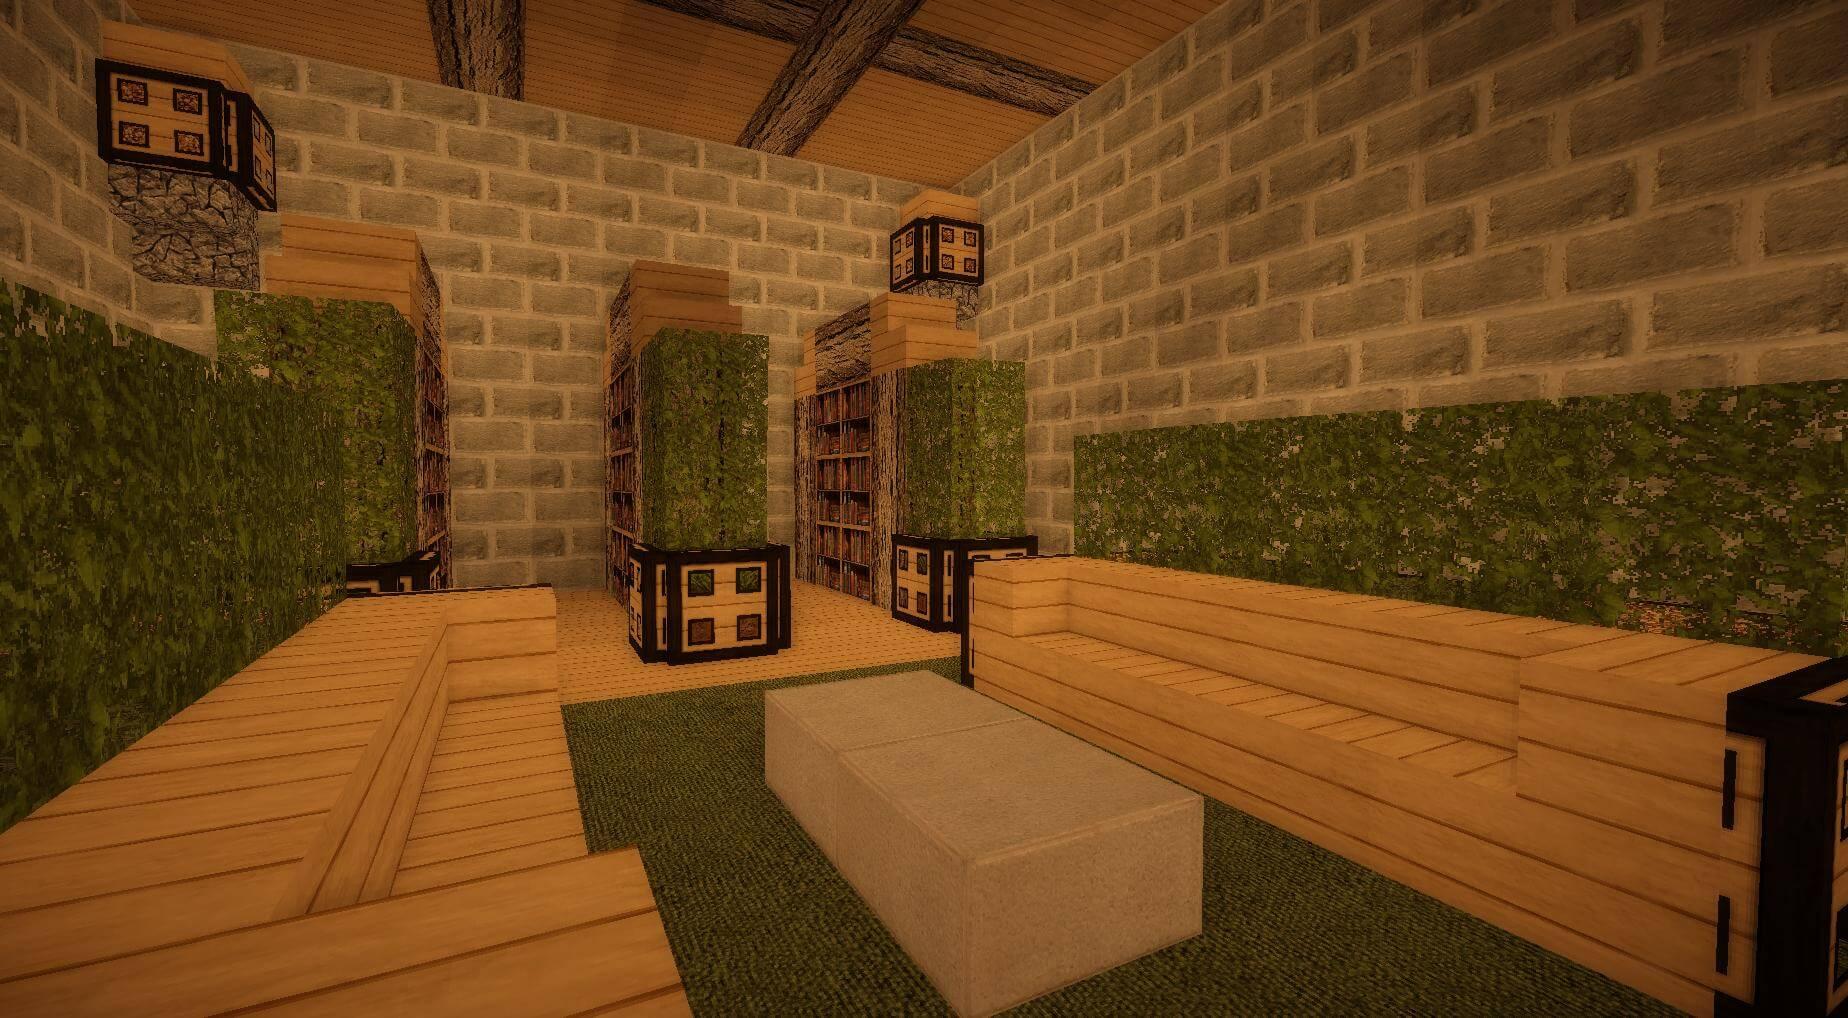 Life - Texture Pack Minecraft 1.12.2, 1.12, 1.8, 1.7.10